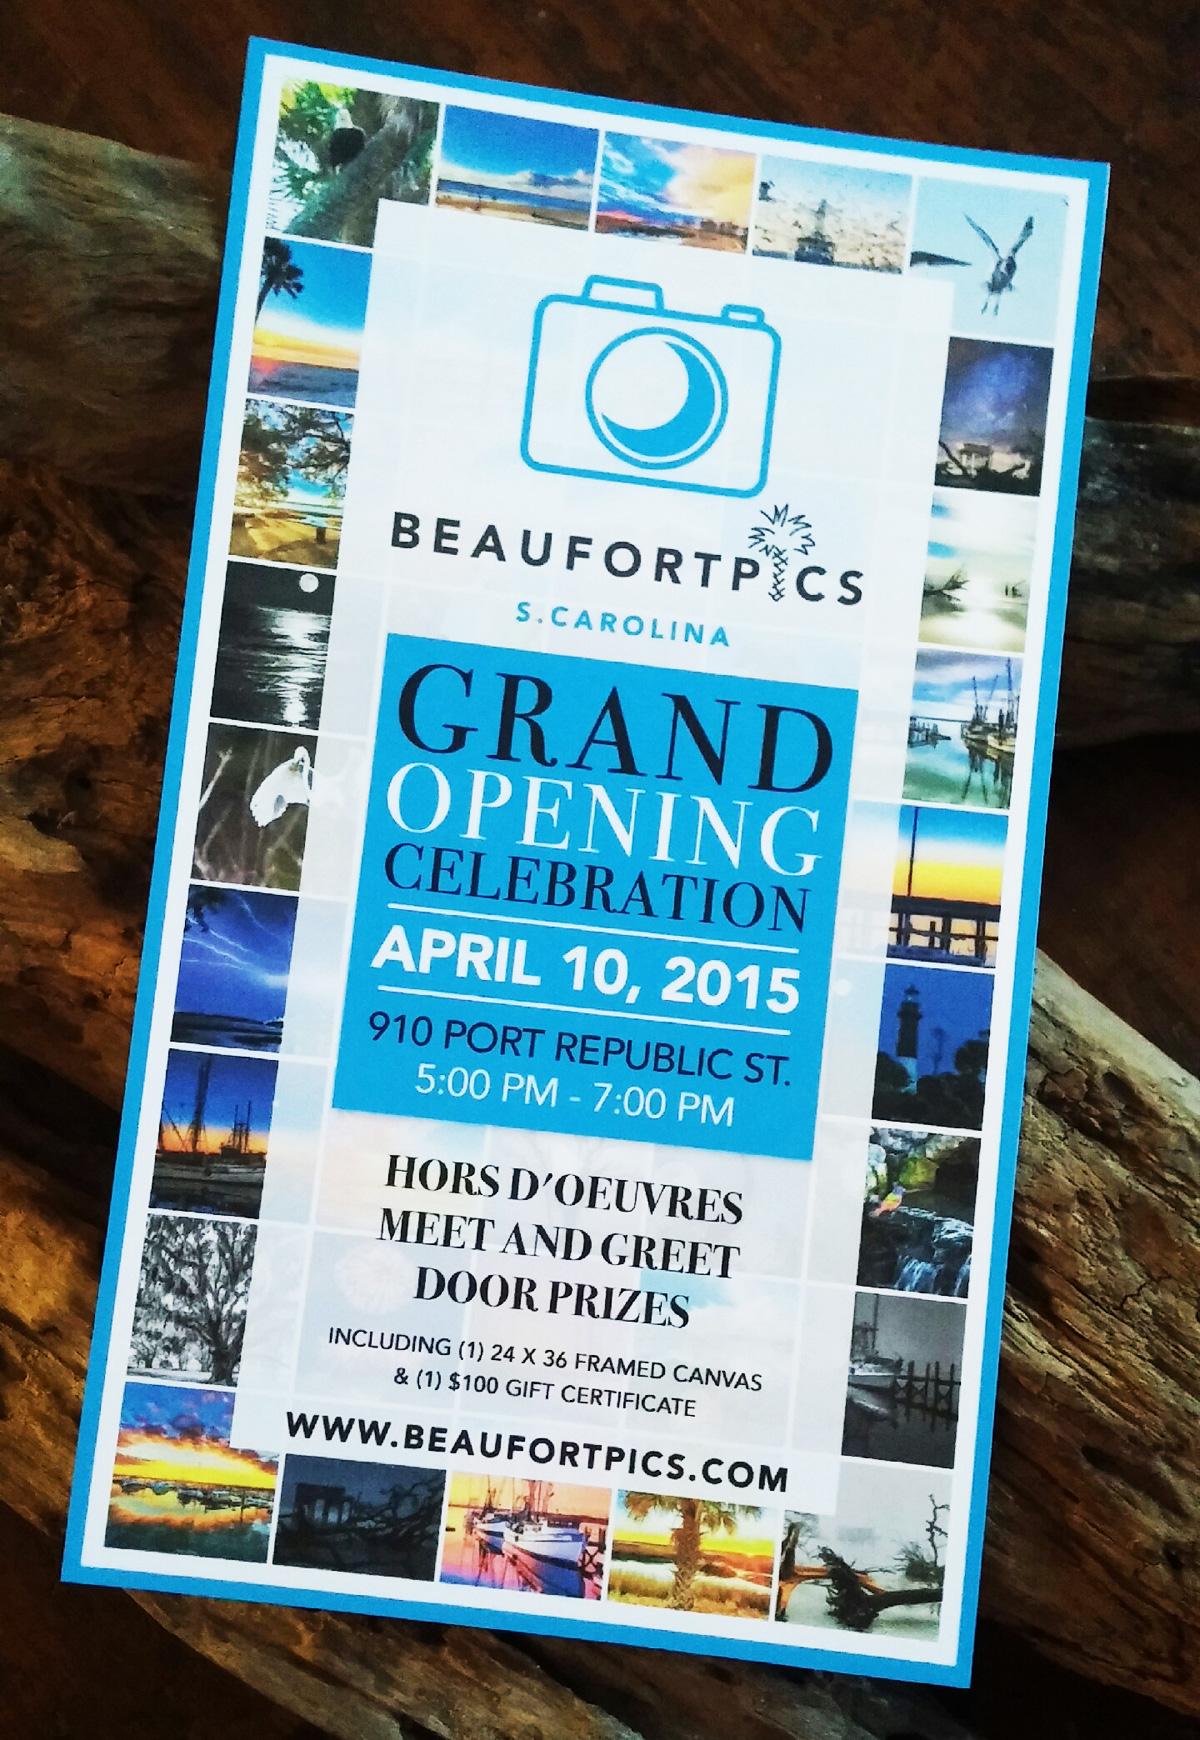 BeaufortPics.com Grand Opening